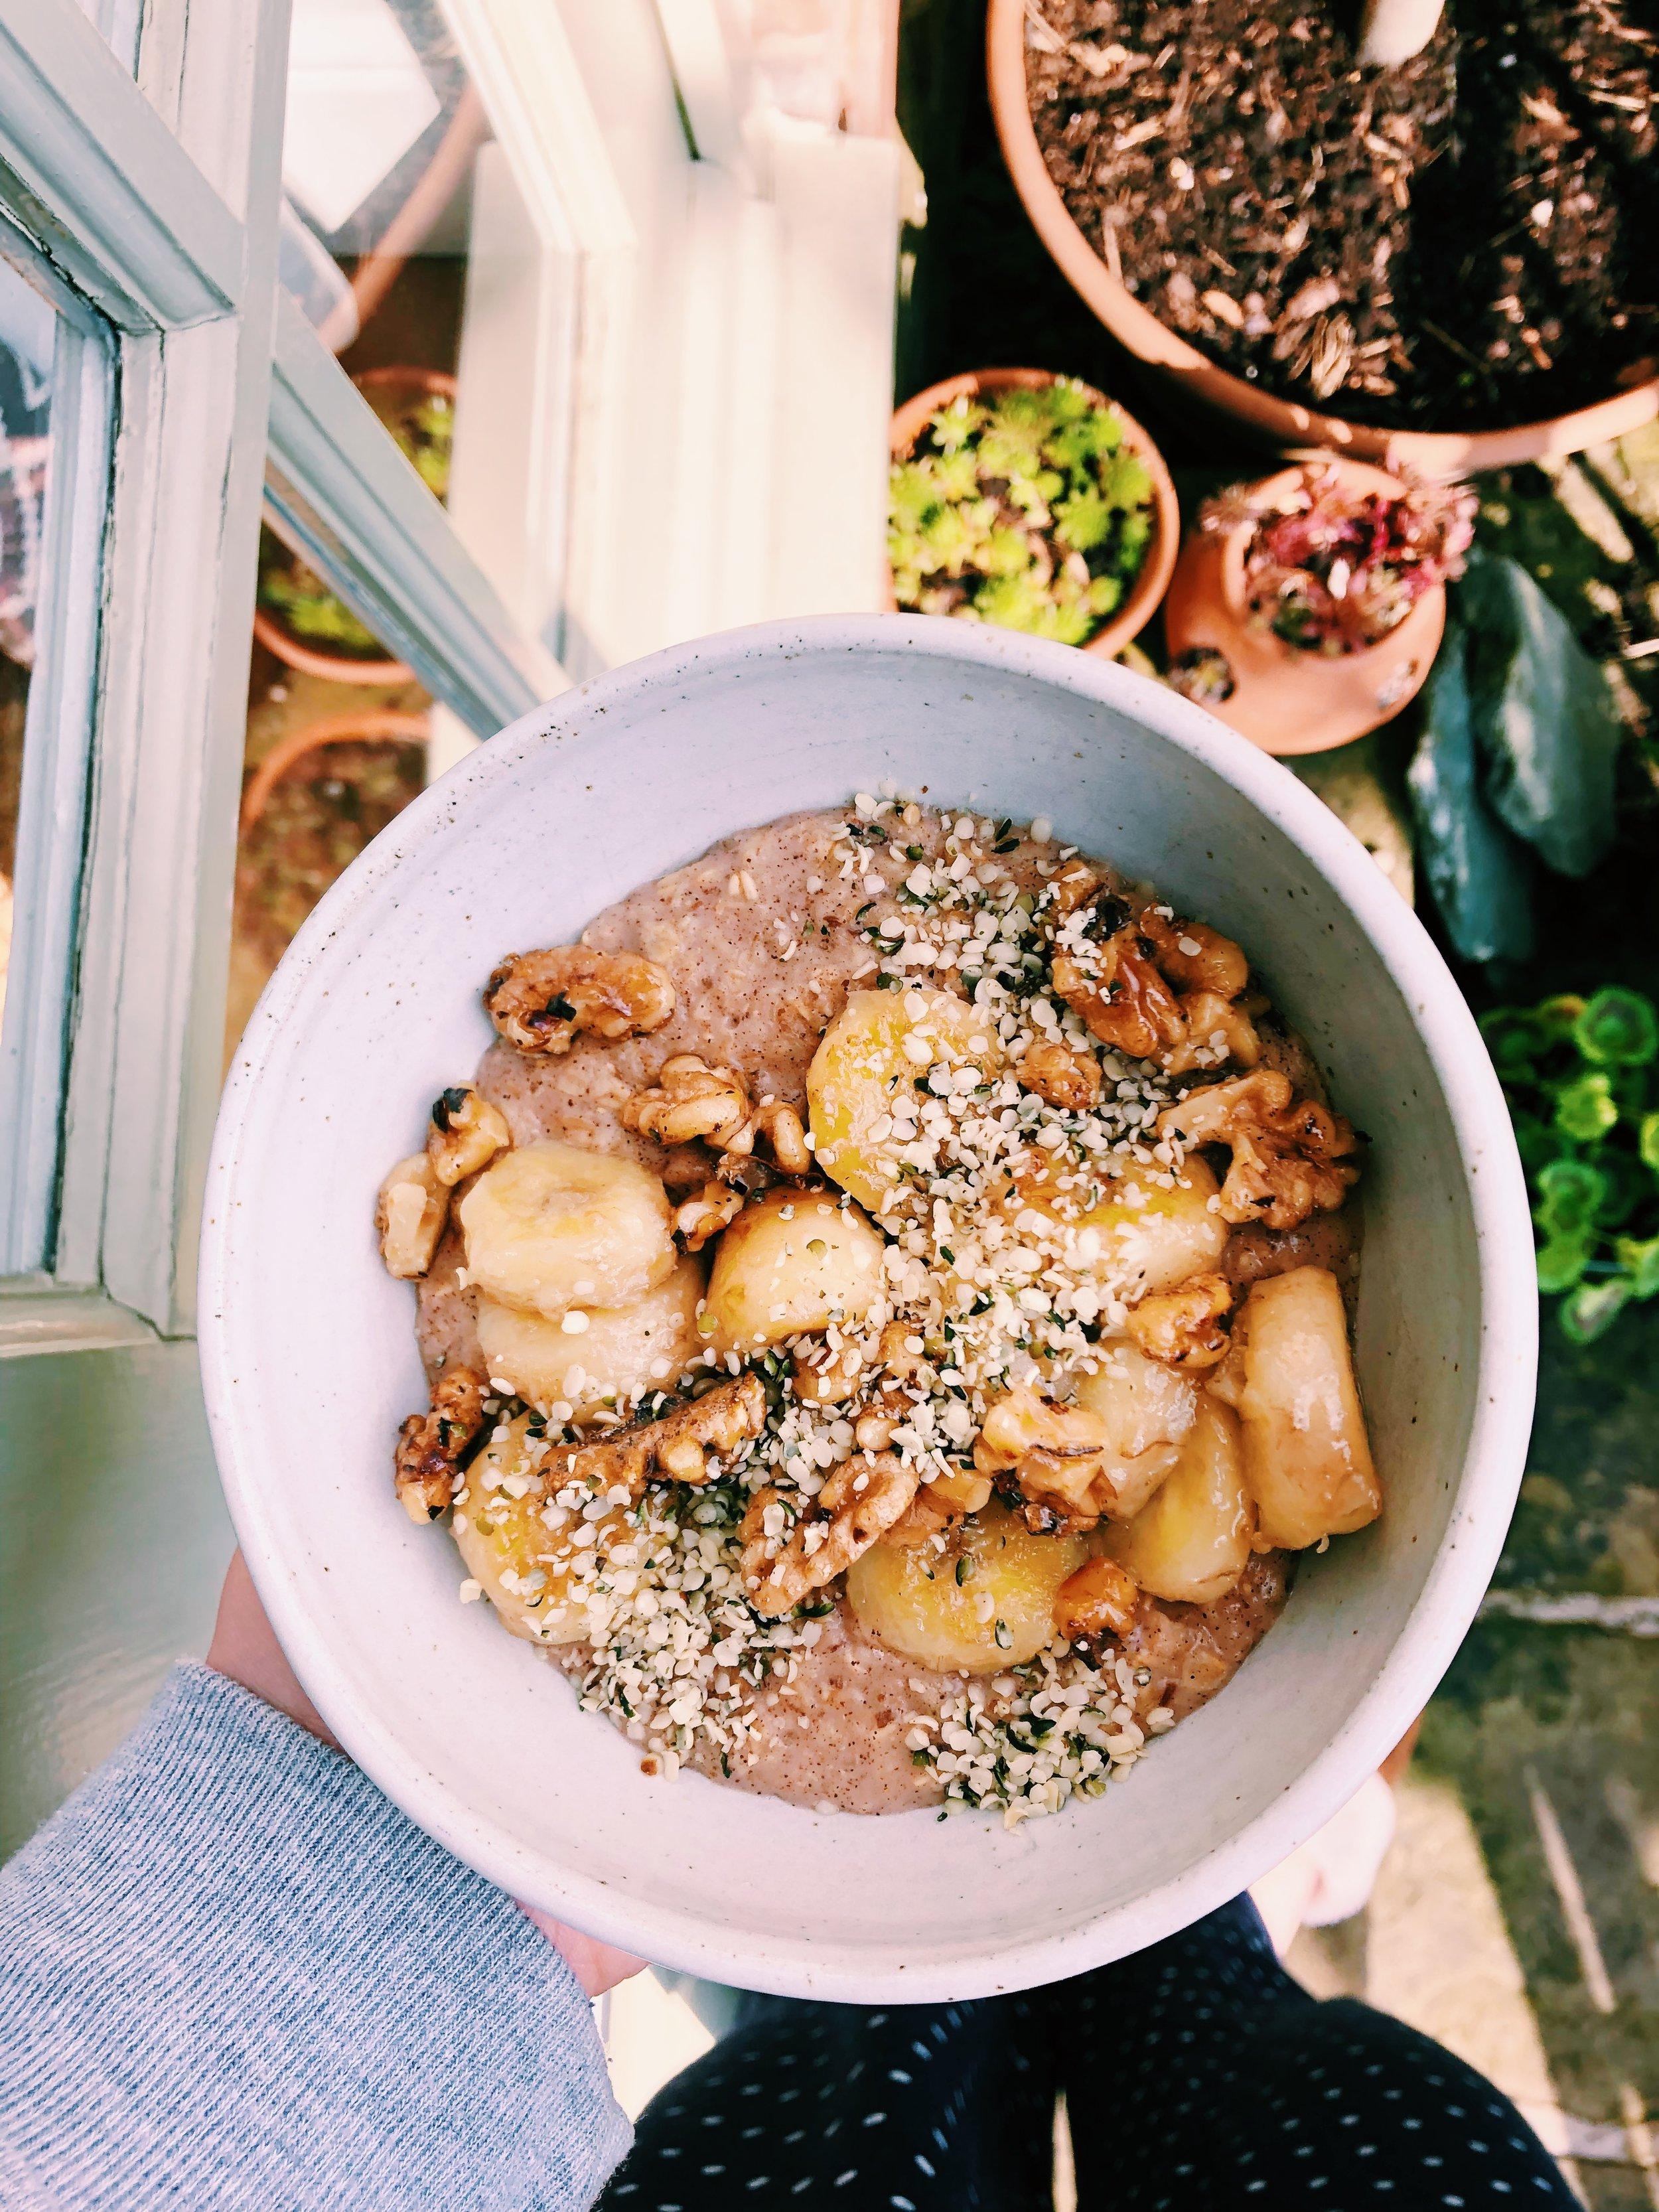 Cinnamon Porridge with Candied Walnuts and Fried Banana